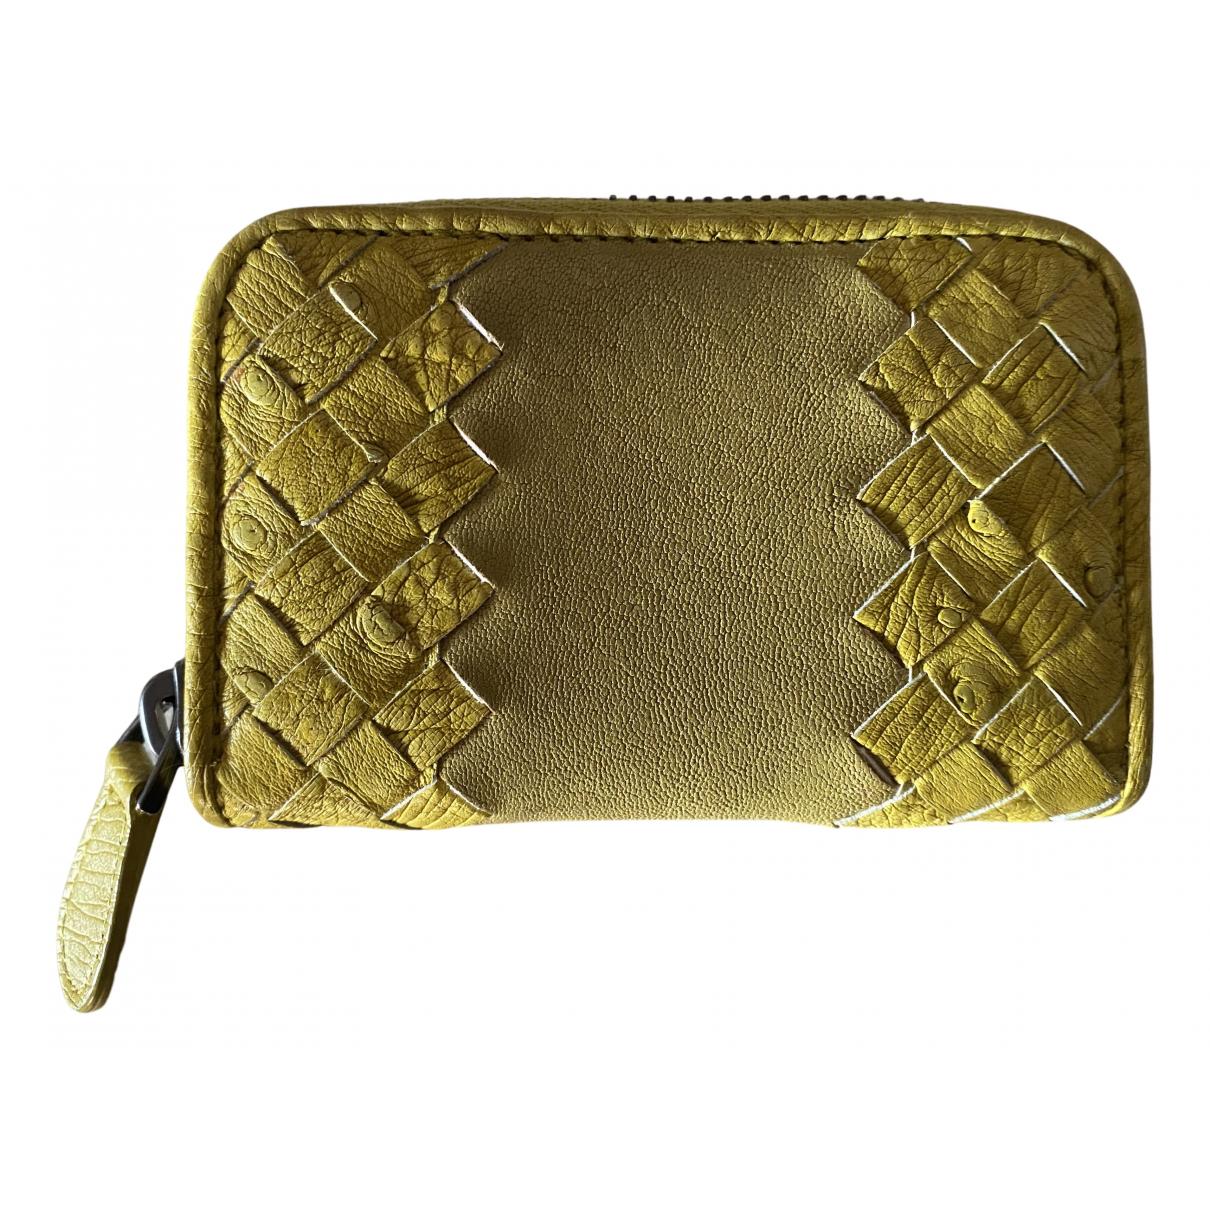 Bottega Veneta - Portefeuille Intrecciato pour femme en cuir